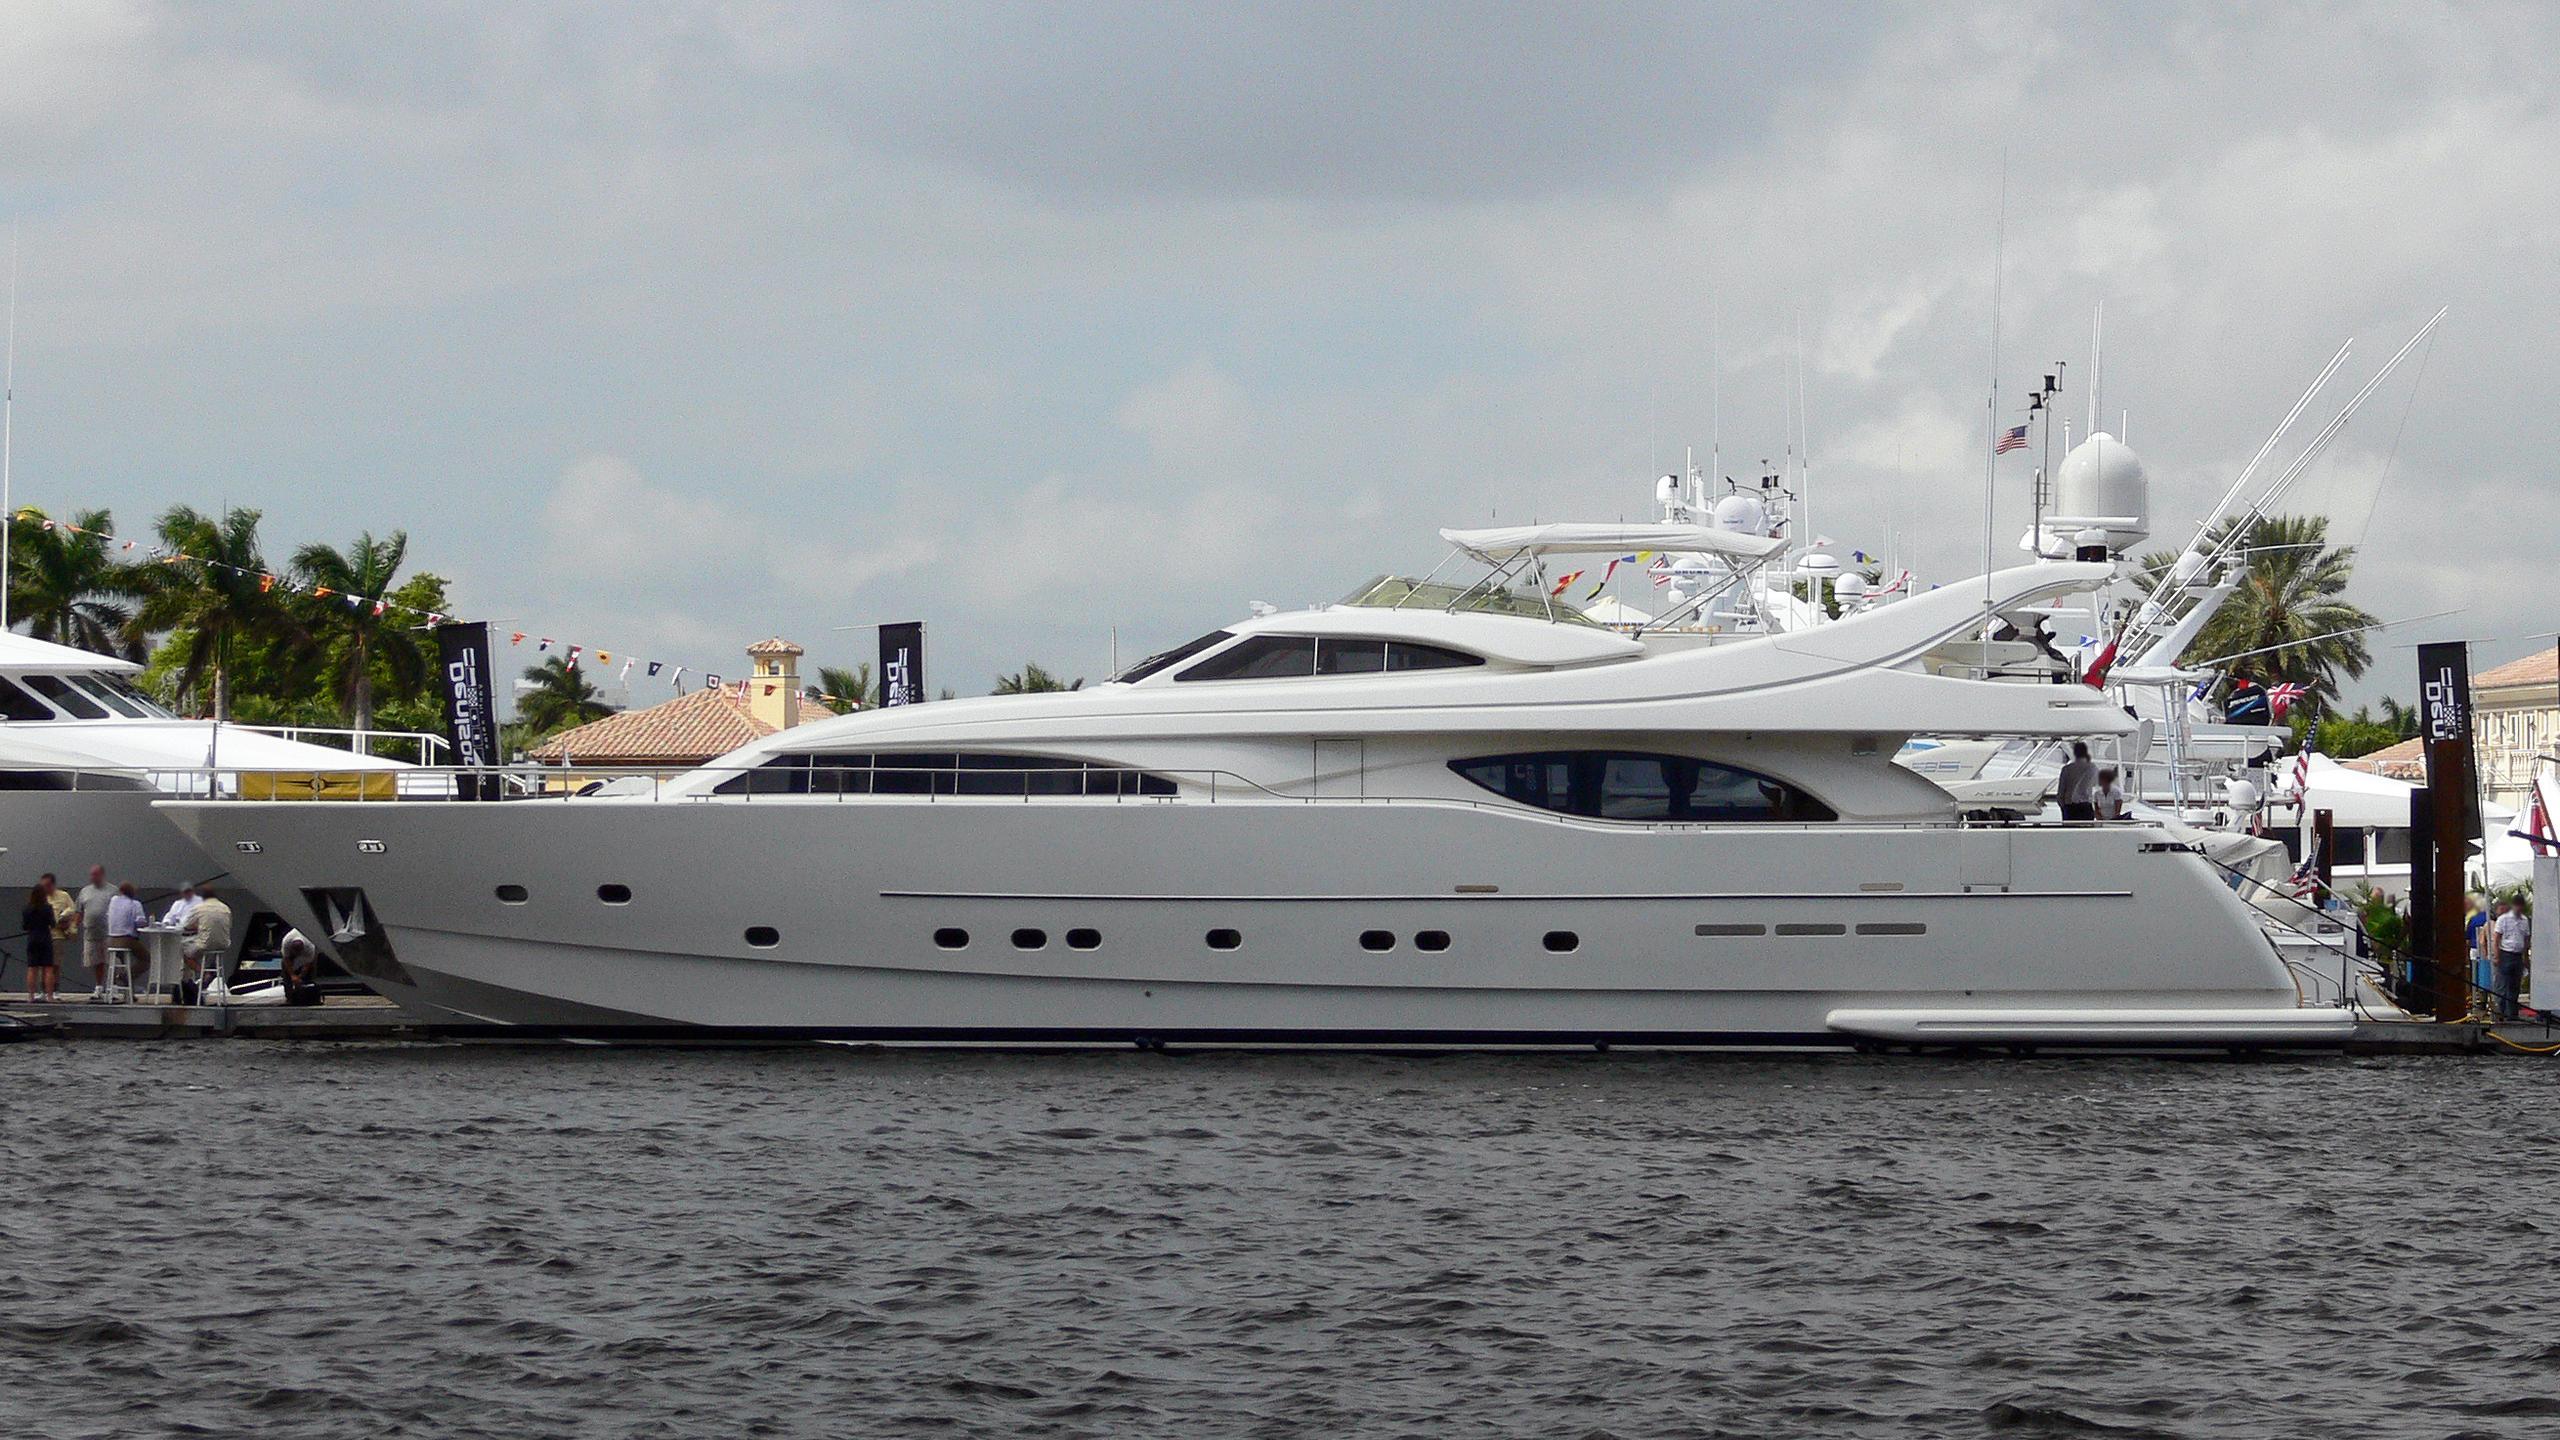 sea-spray motoryacht ferretti custom line 94 2001 29m profile